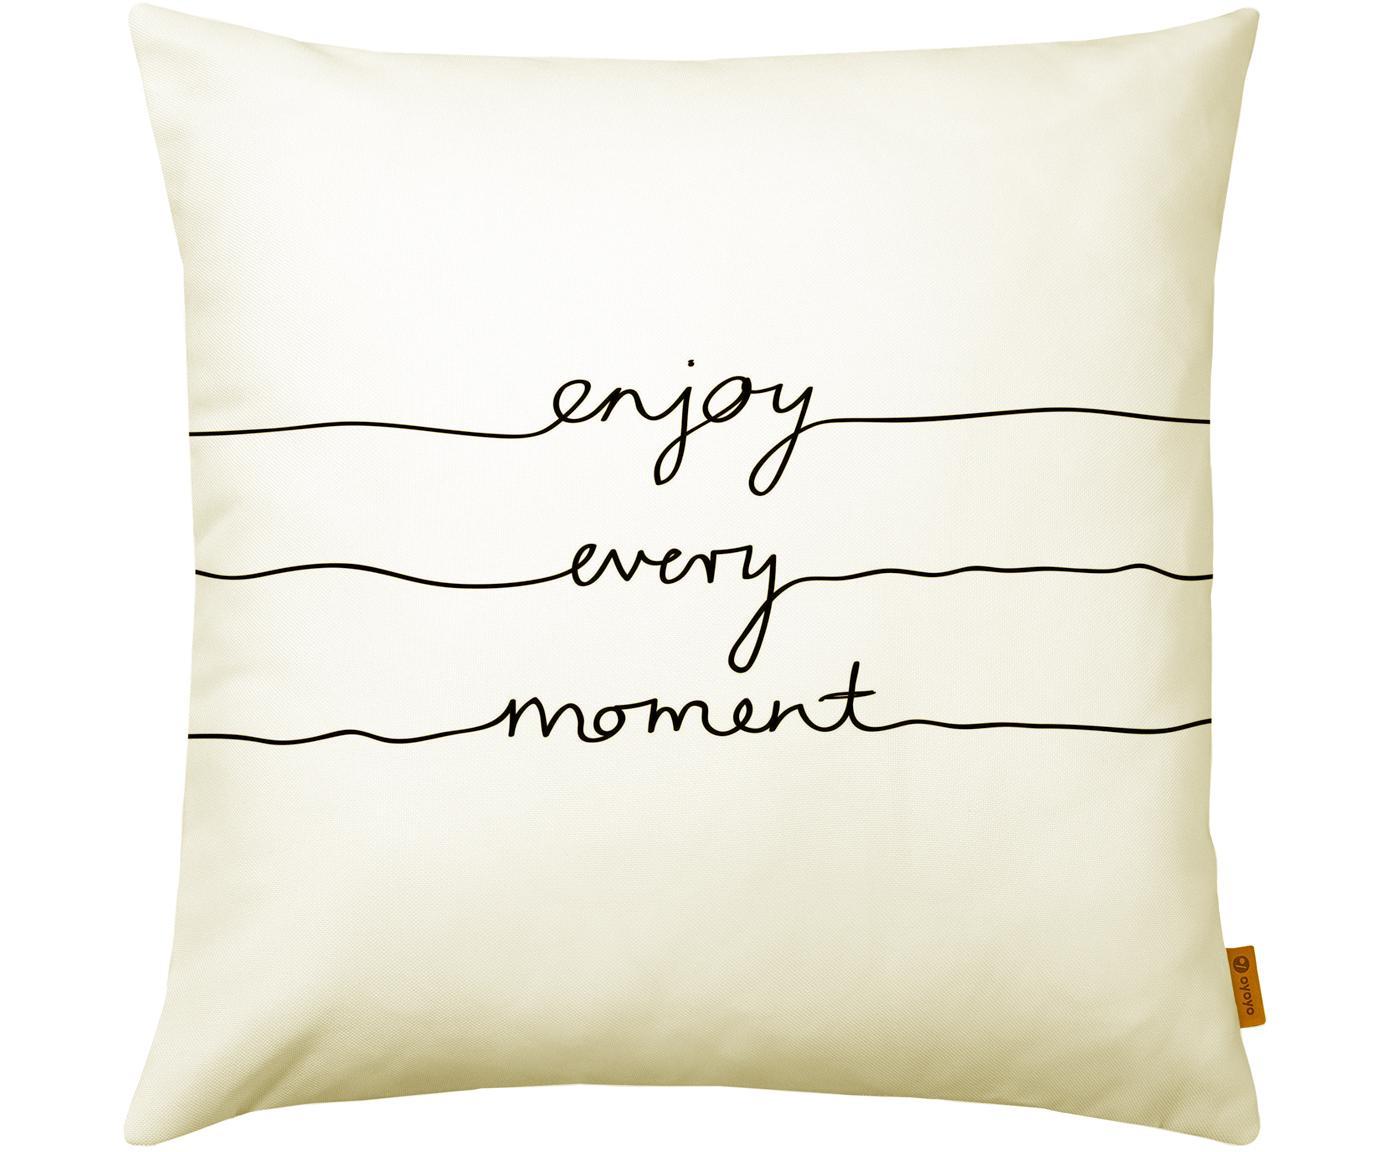 Funda de cojín Enjoy Every Moment, Poliéster, Blanco crema, negro, An 40 x L 40 cm